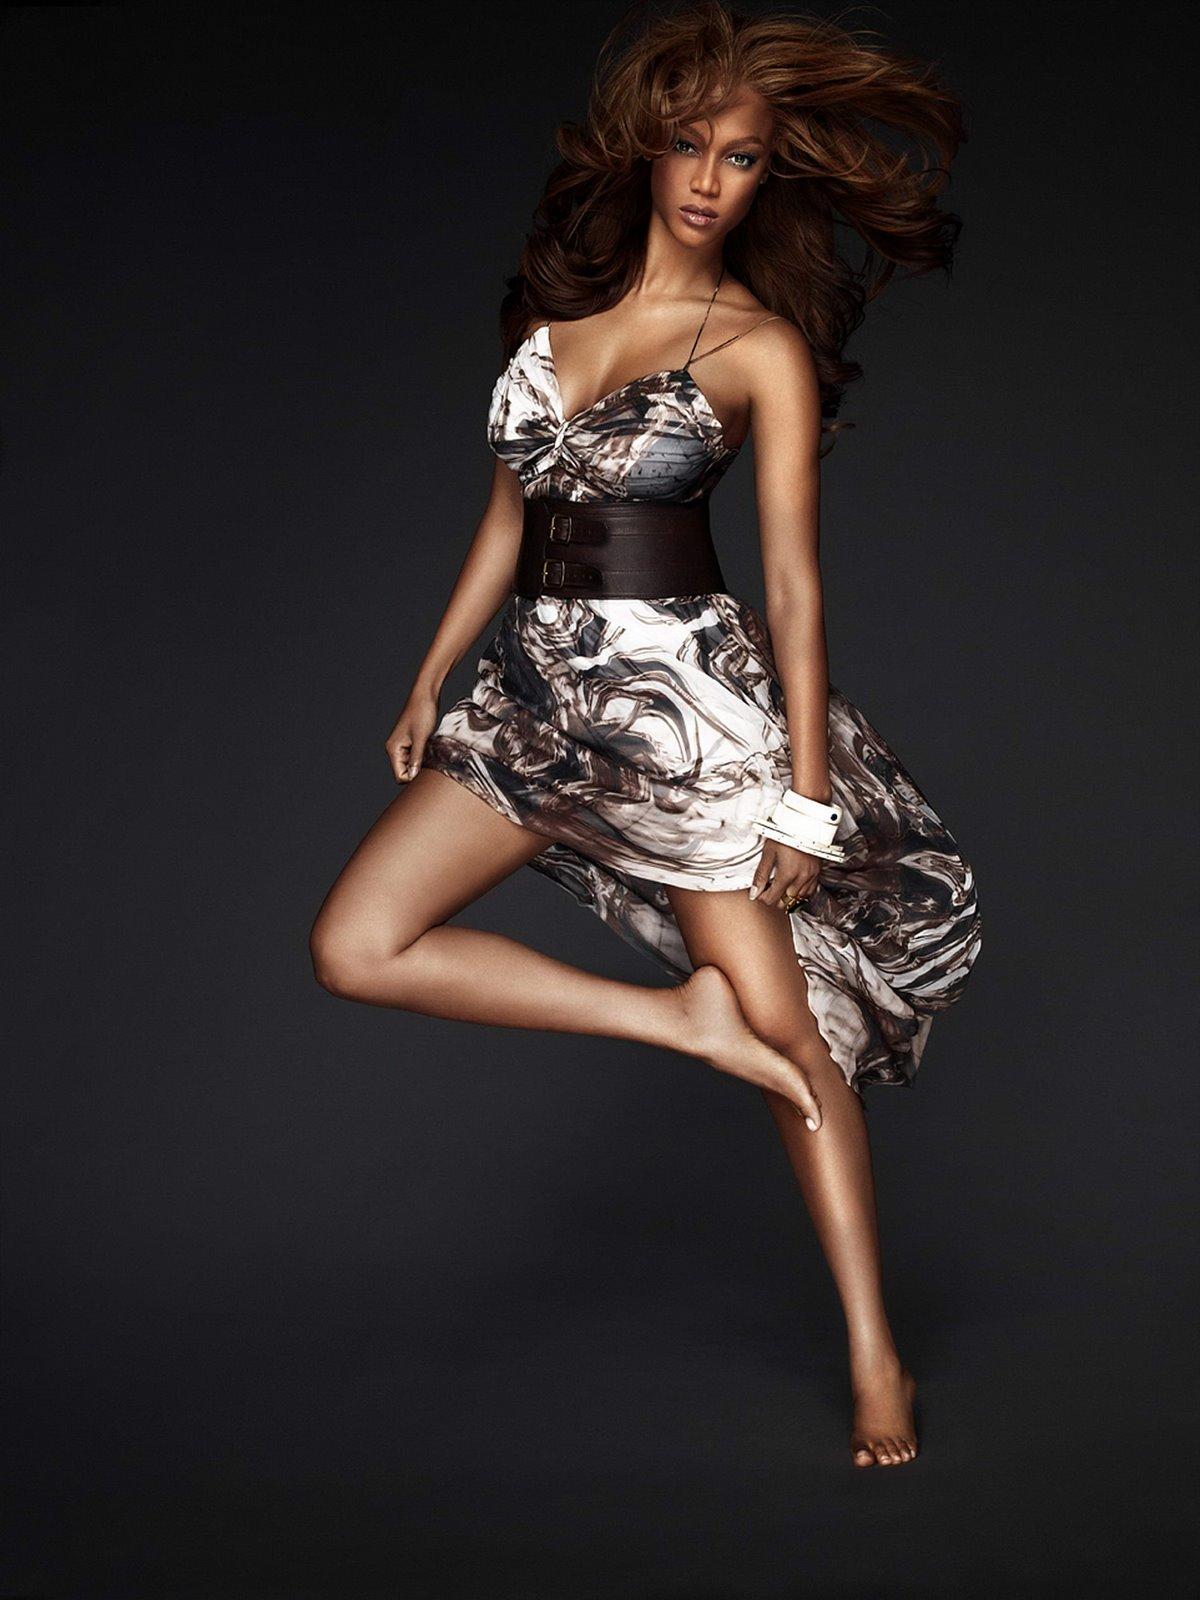 Tyra Banks | Body Measurements